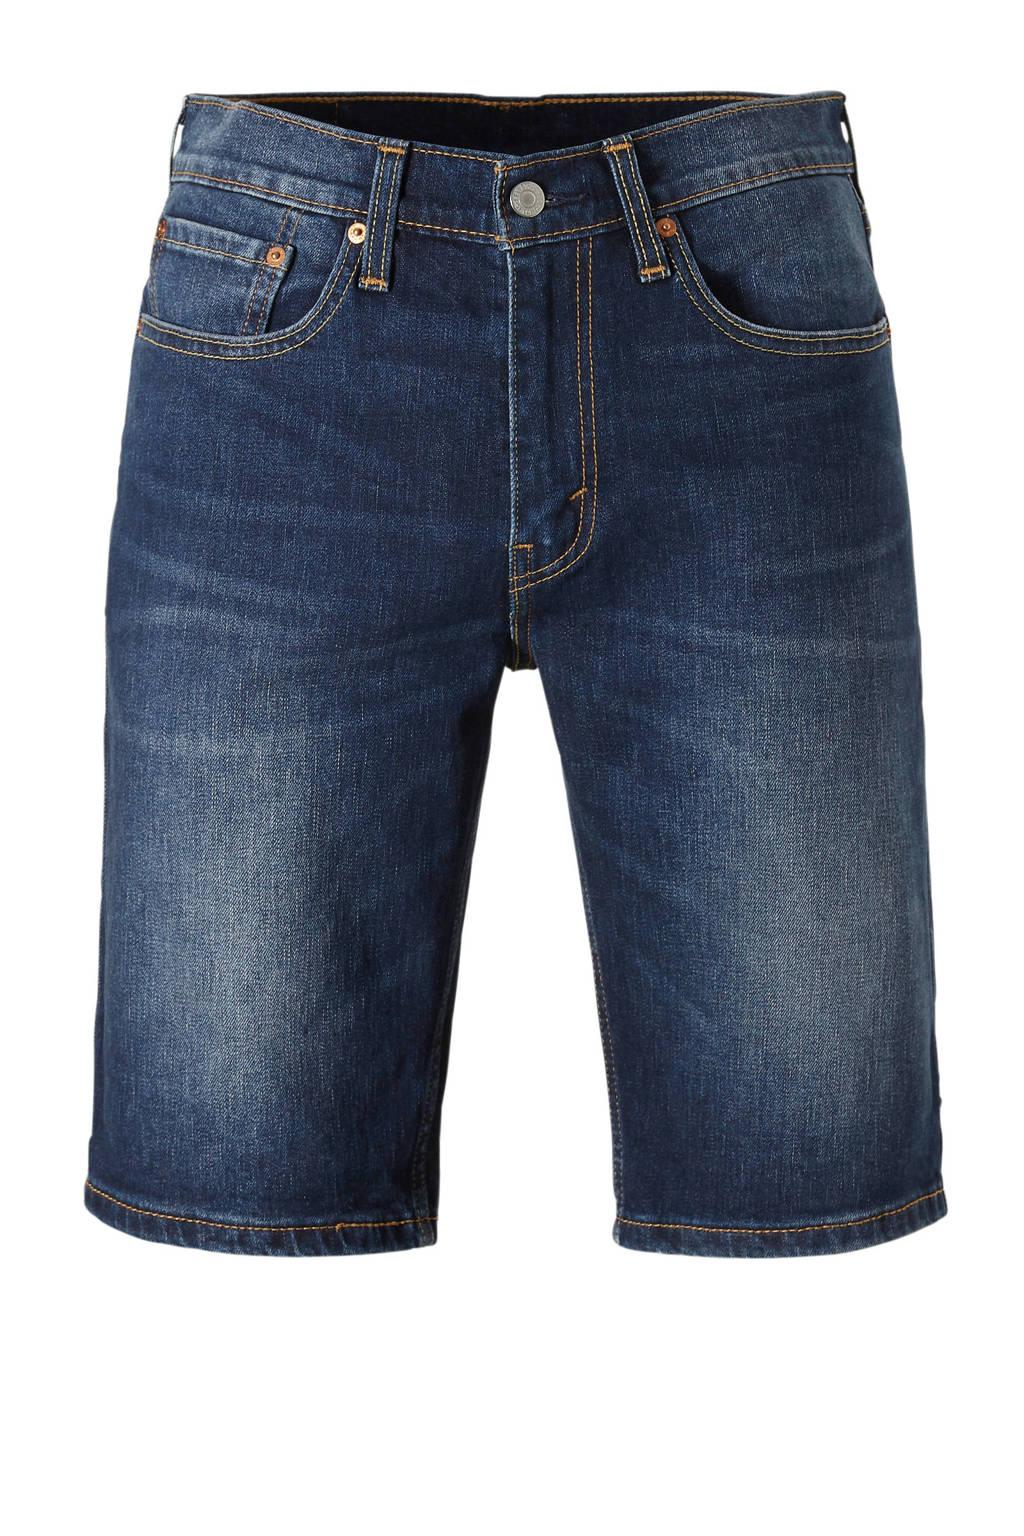 Levi's jeans short slim fit 502, Dark denim